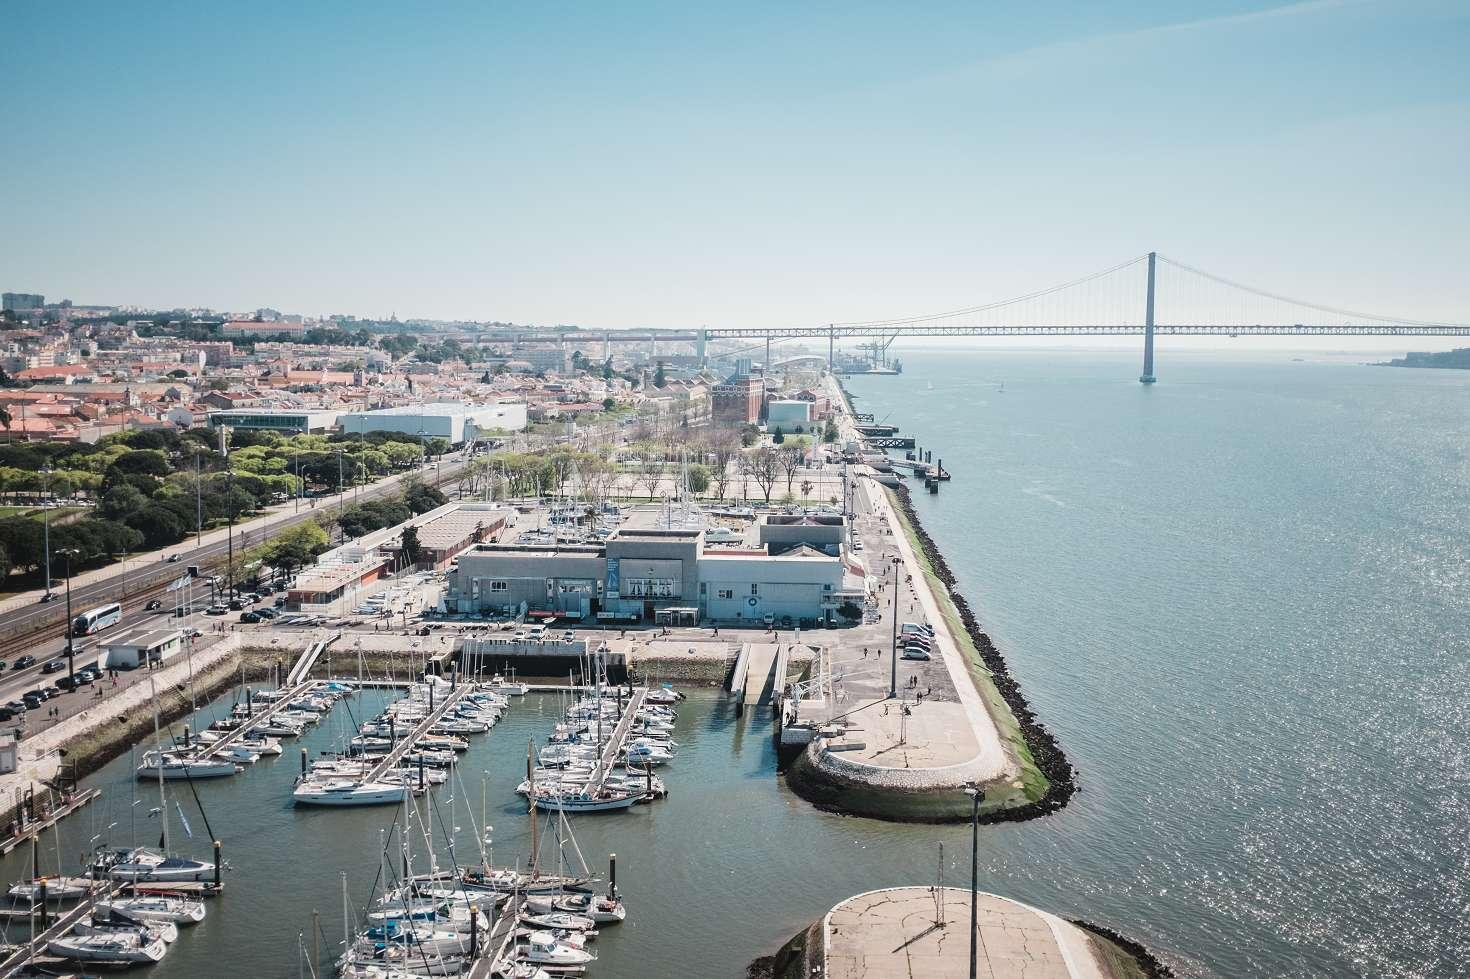 Valencia-Lissabon-Vigo-Stonehenge (22)